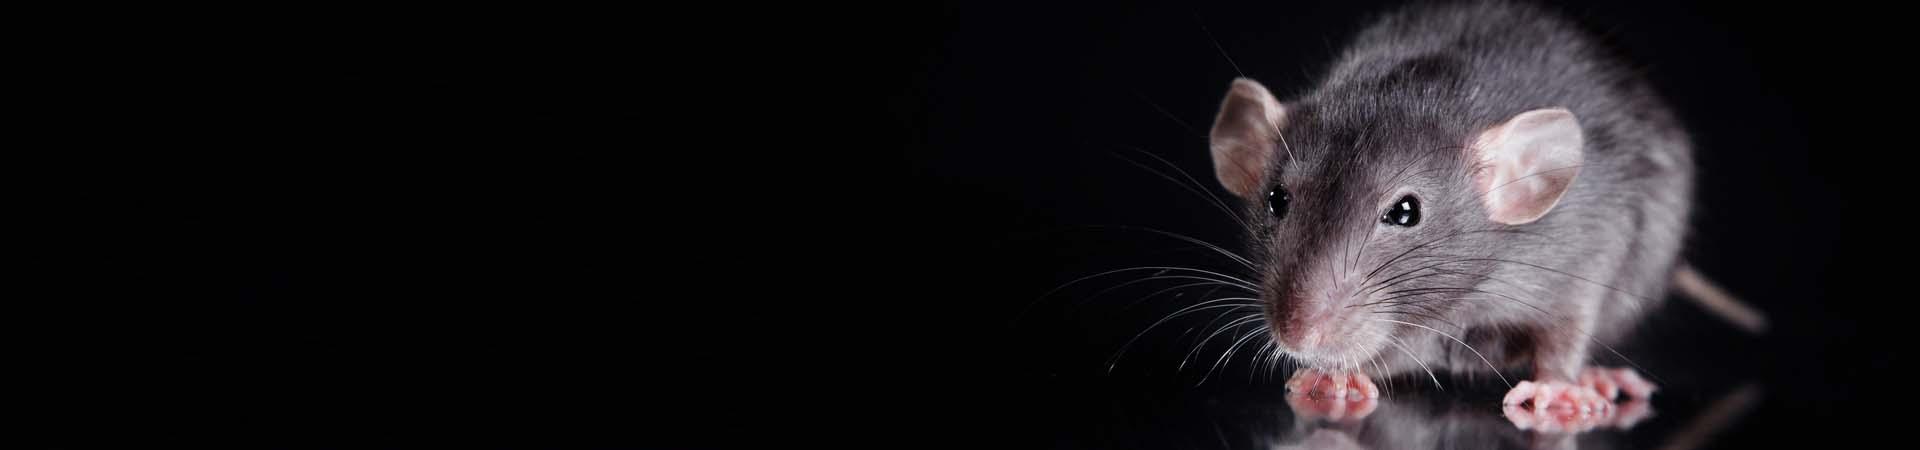 1920w-450h-slider-rodents1